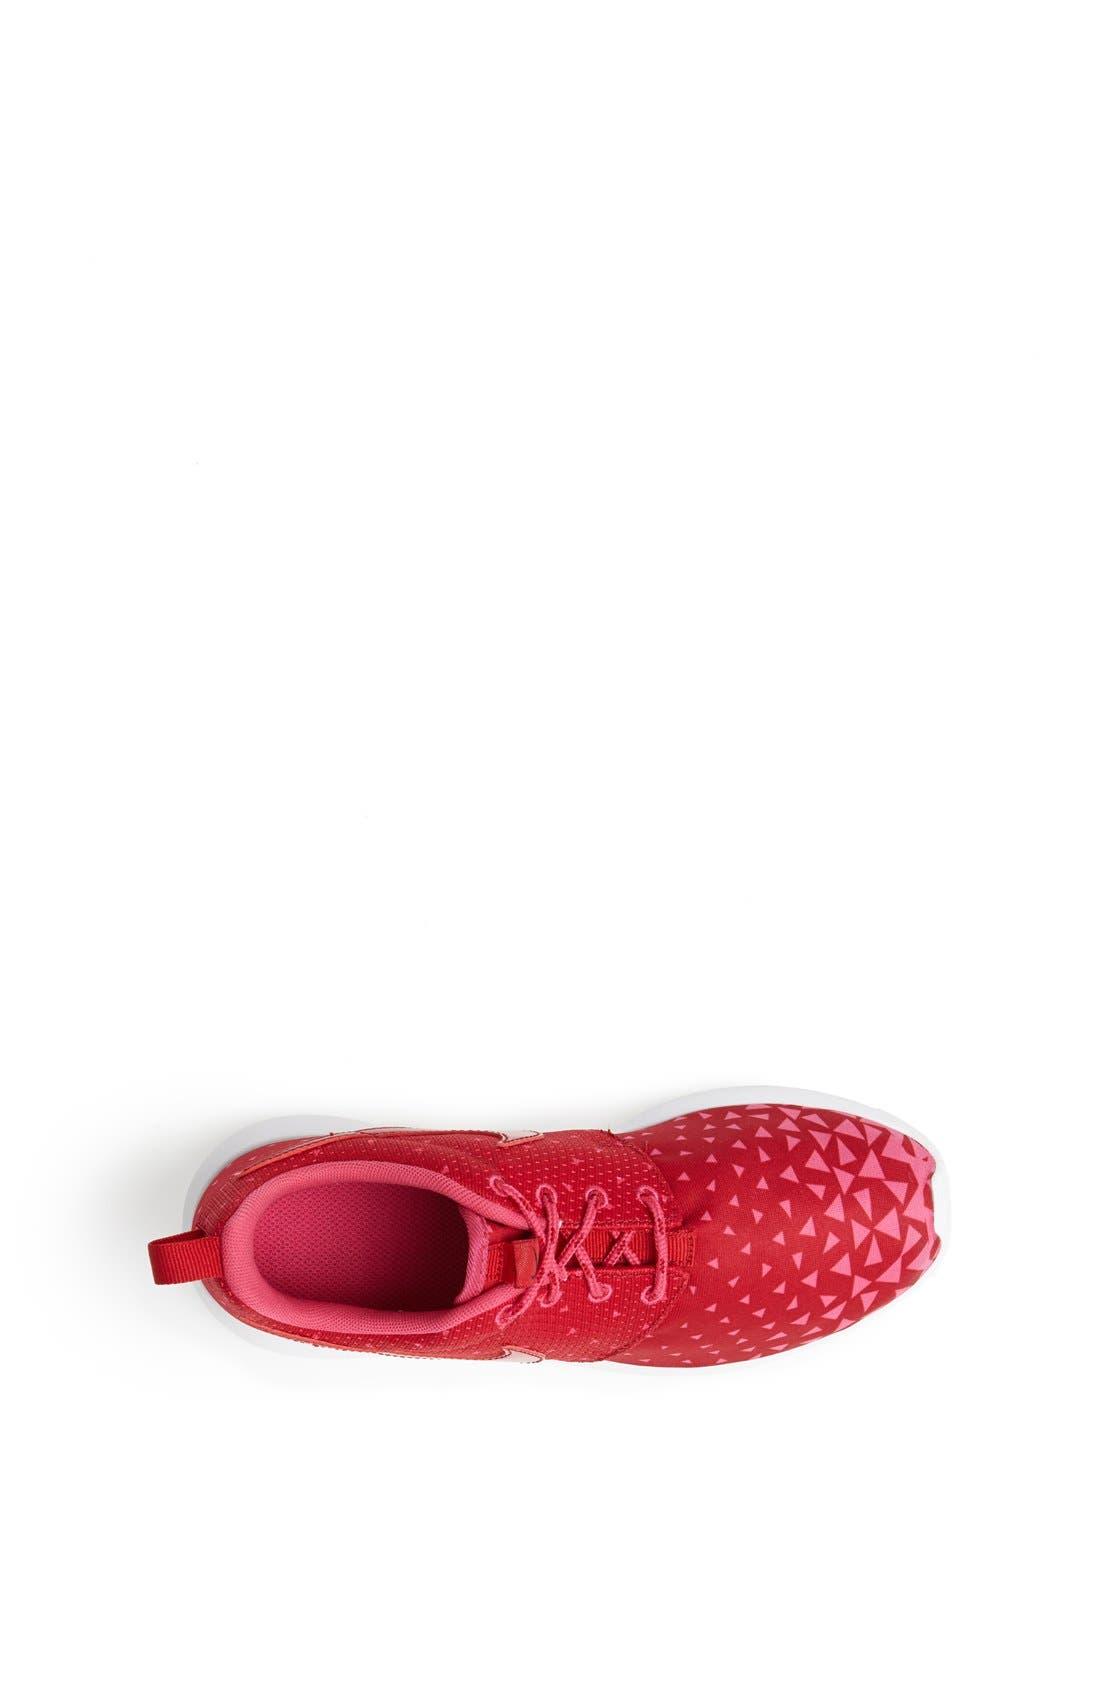 'Roshe Run' Athletic Shoe,                             Alternate thumbnail 138, color,